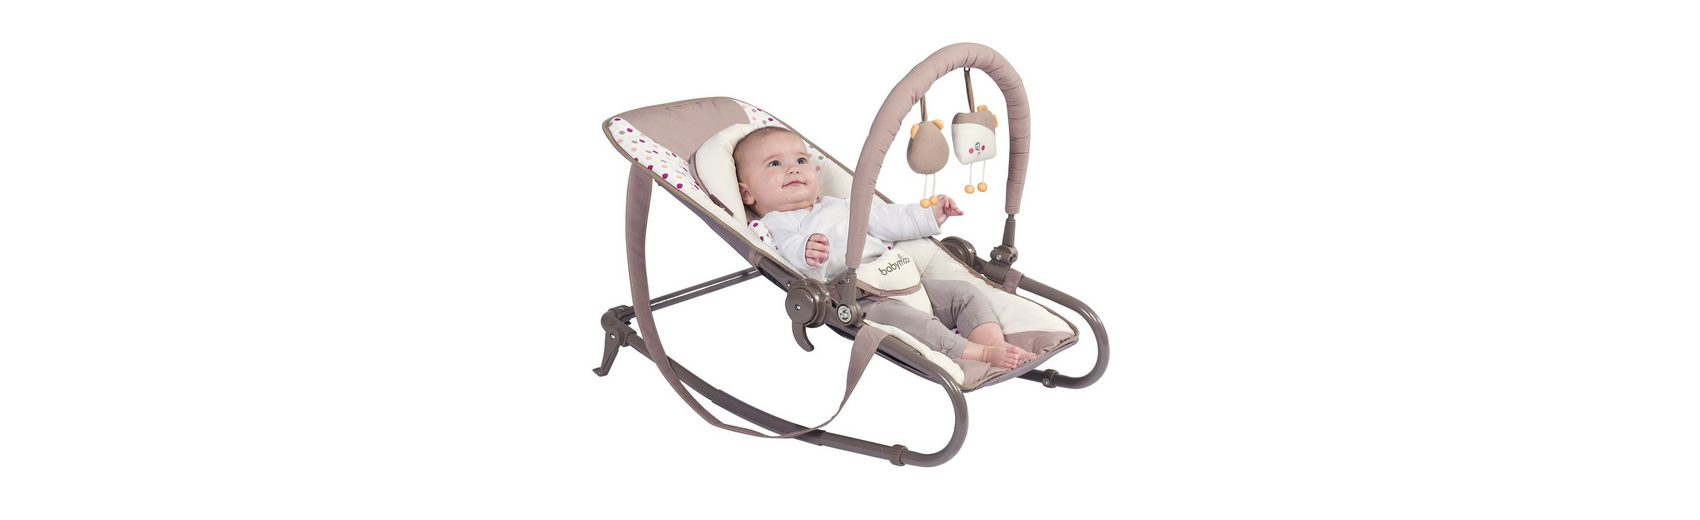 Babymoov Wippe Bubble, braun/aqua